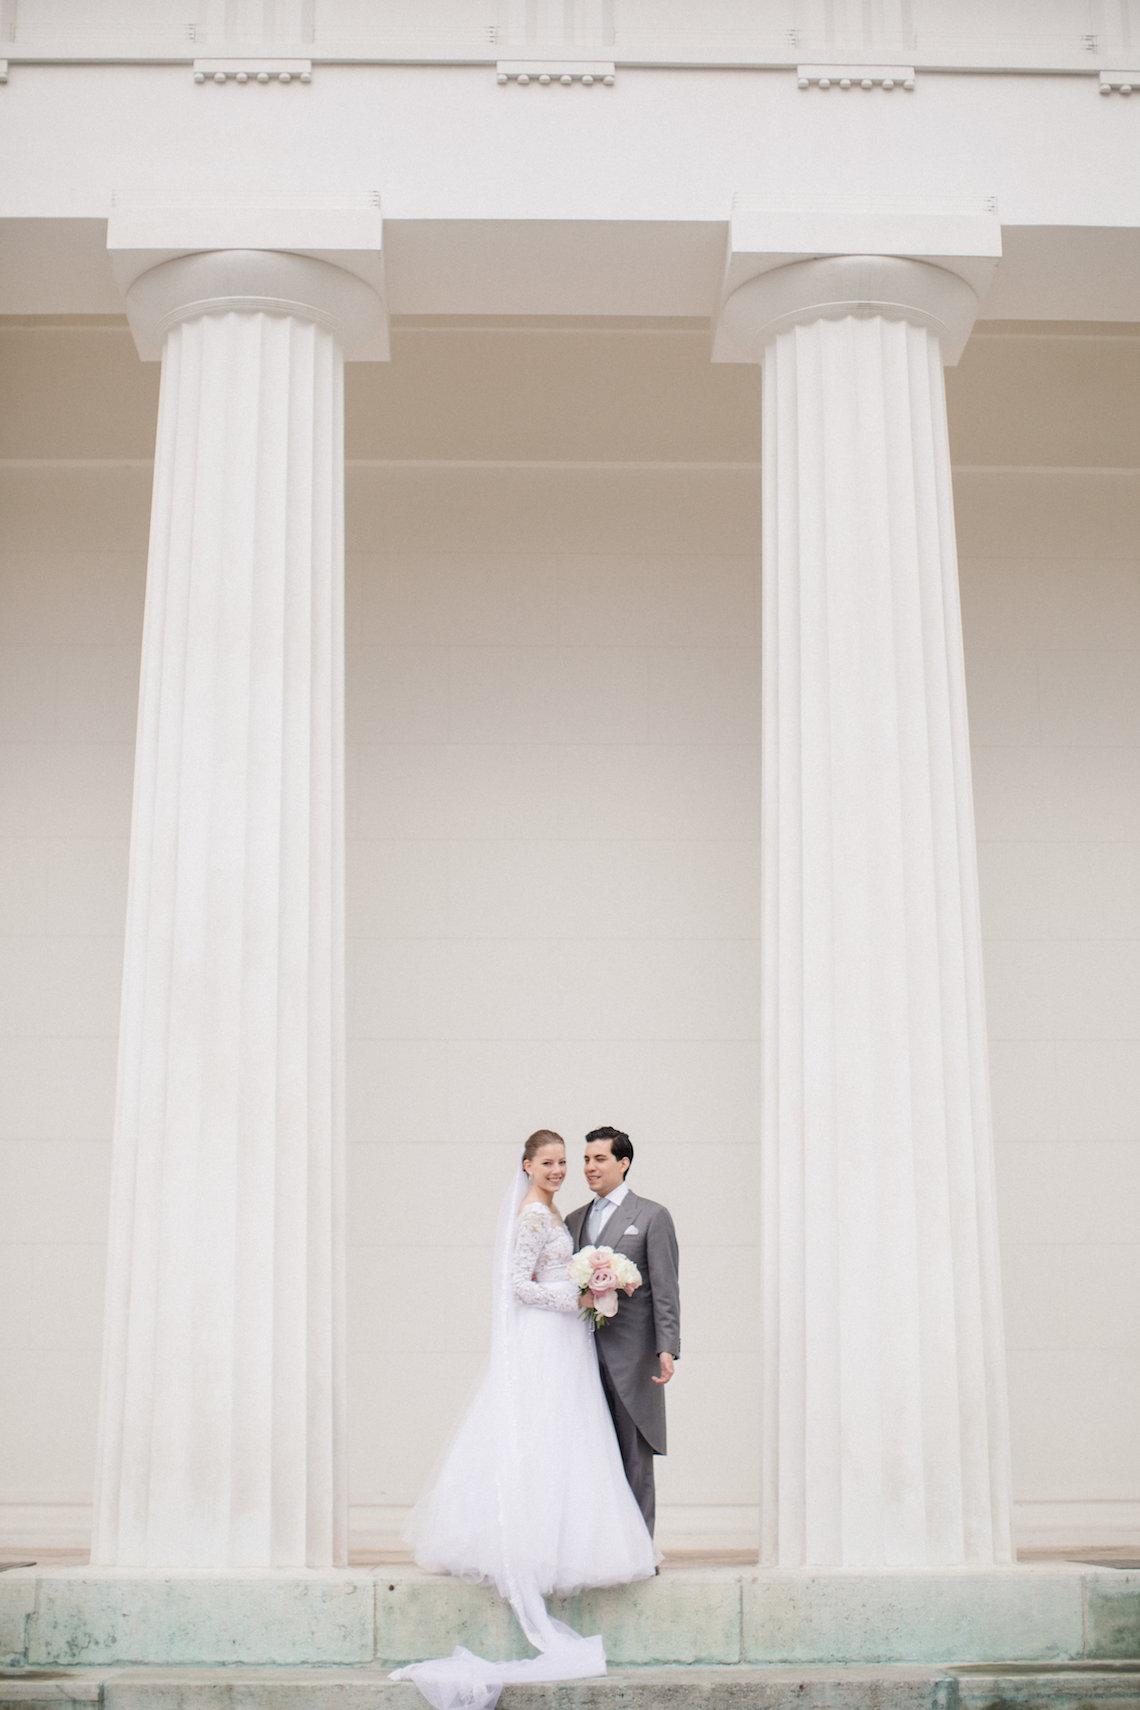 An Elegant Royal Vienna Destination Wedding | A Very Beloved Wedding | Sandra Aberg 23